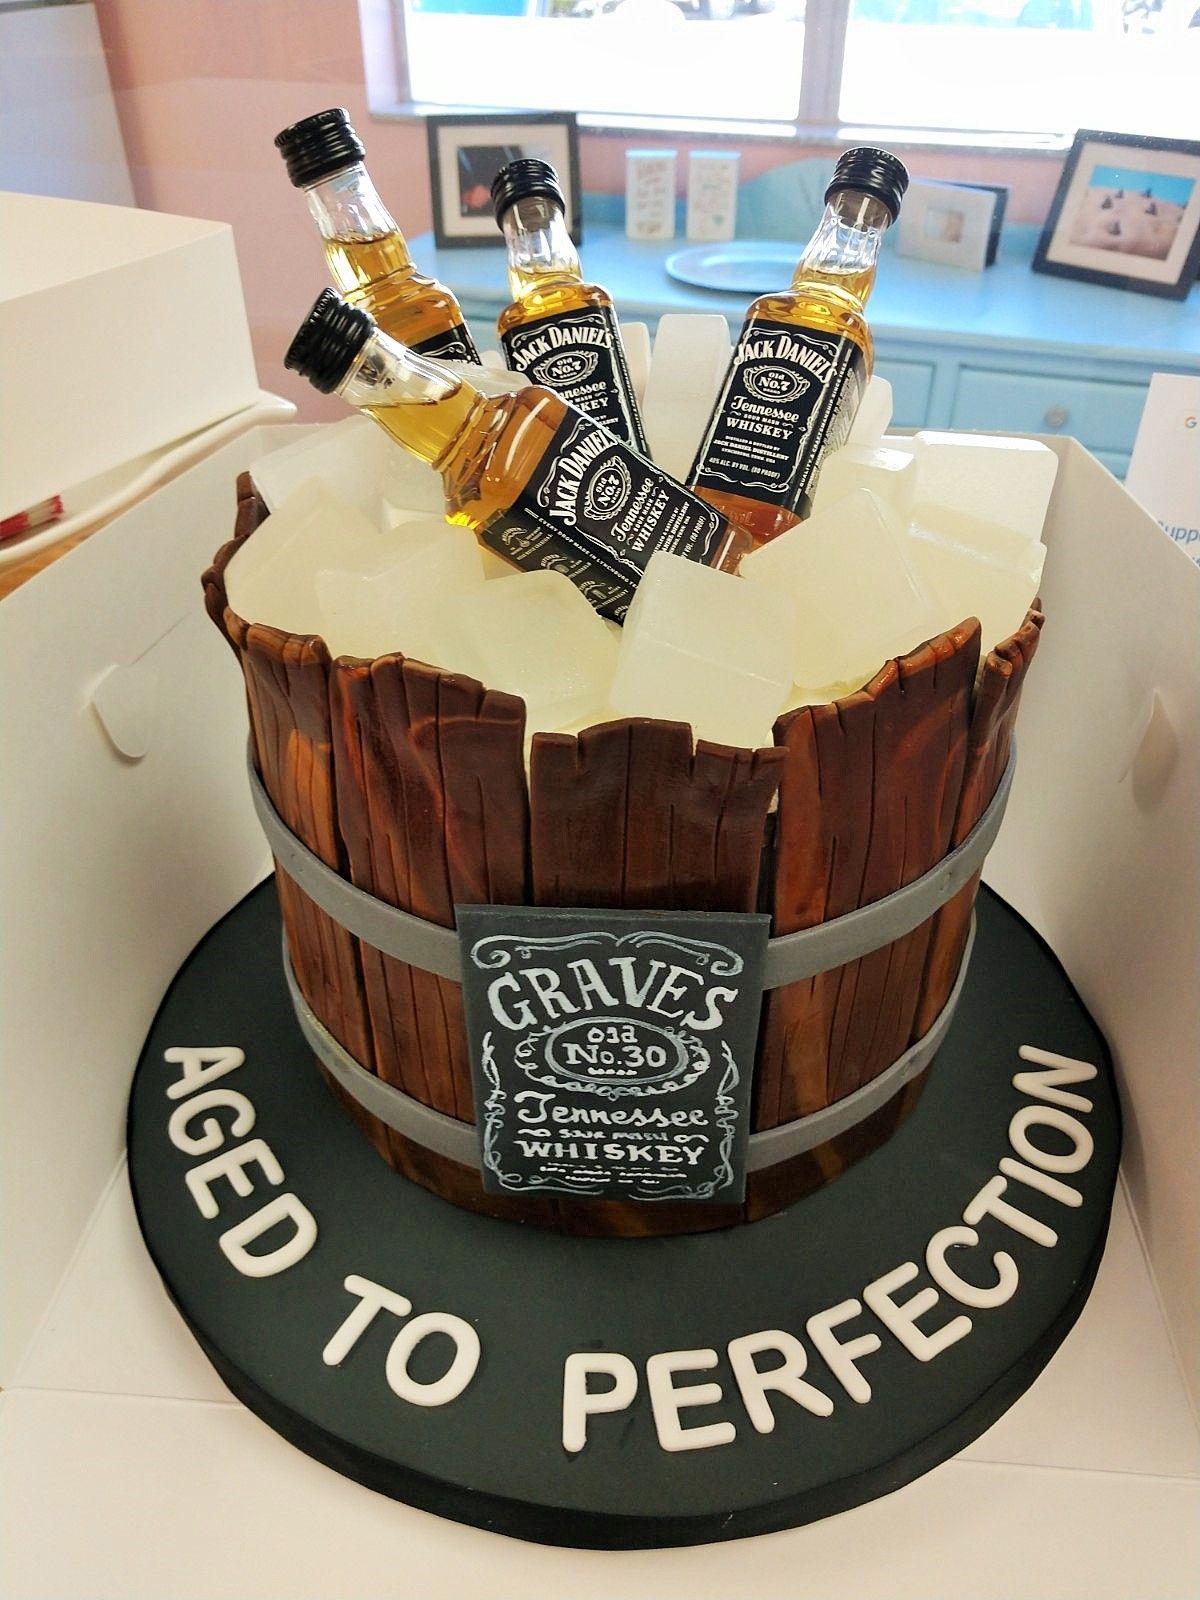 Jack Daniels Cake 30th Birthday Cake Birthday Cakes